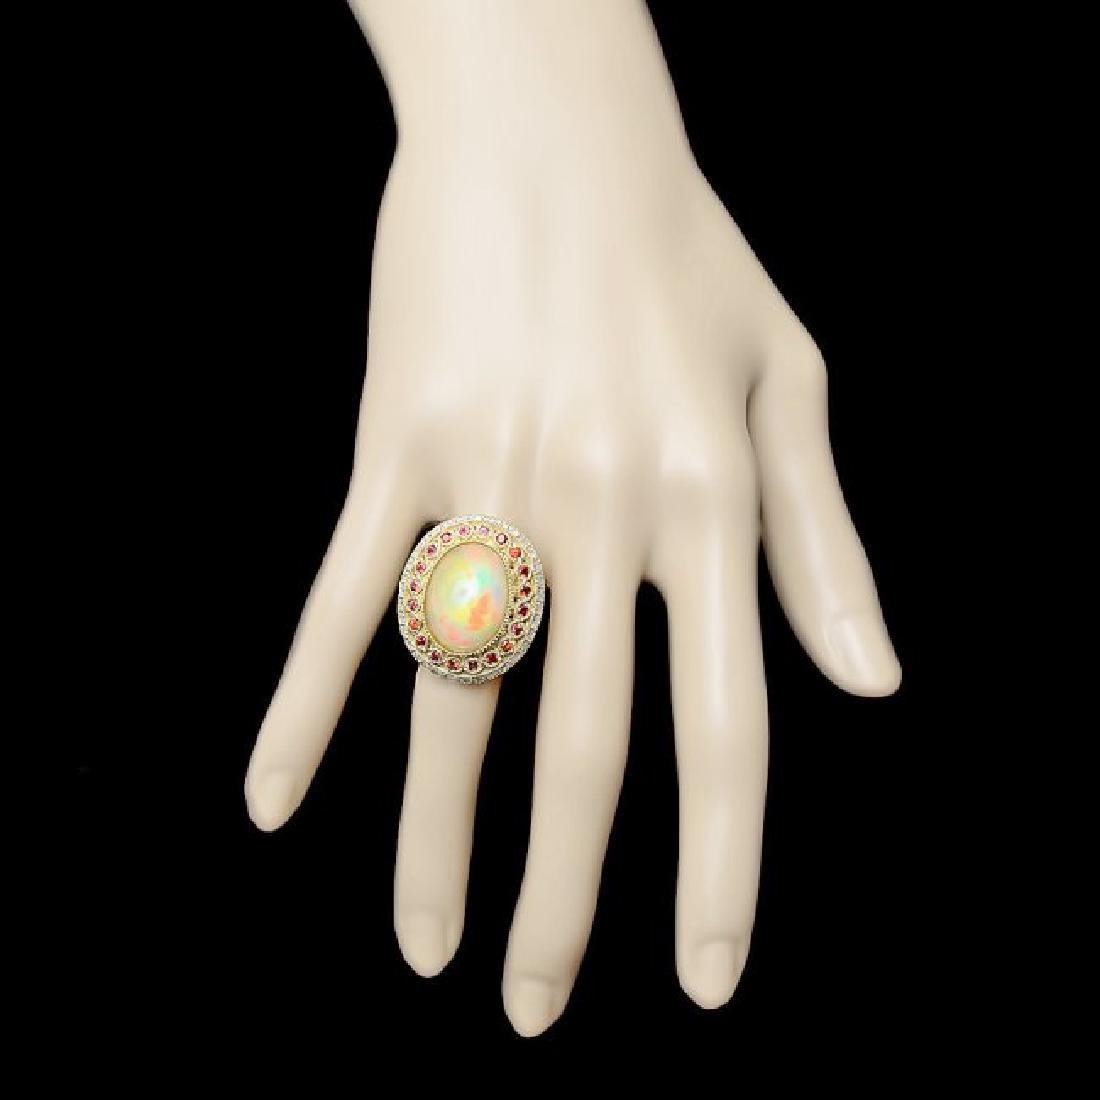 14k Yellow Gold 8.00ct Opal 1.20ct Diamond Ring - 4